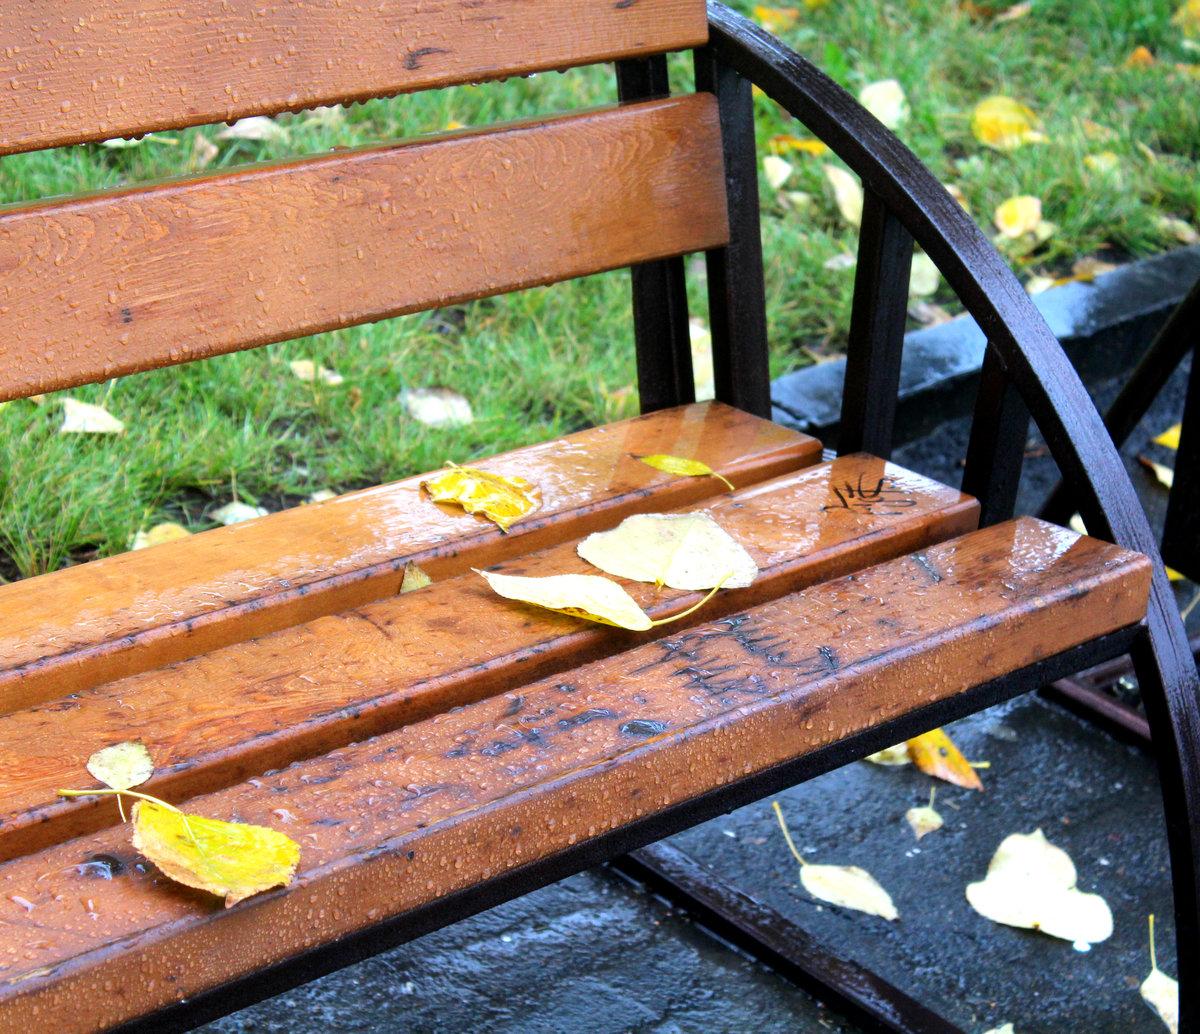 добавил, картинки скамейка и дождь член размаху